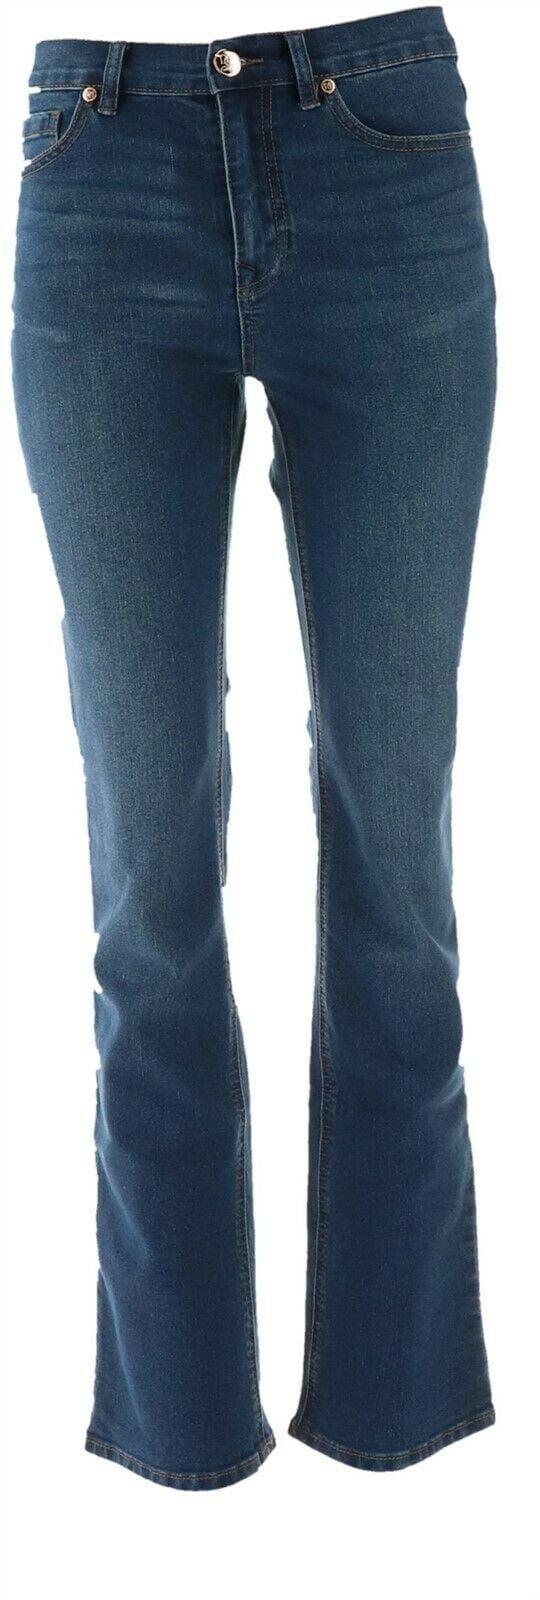 DG2 Diane Gilman Stretch Boot-Cut Jean Basic Colors Chambray 10P NEW 535-198